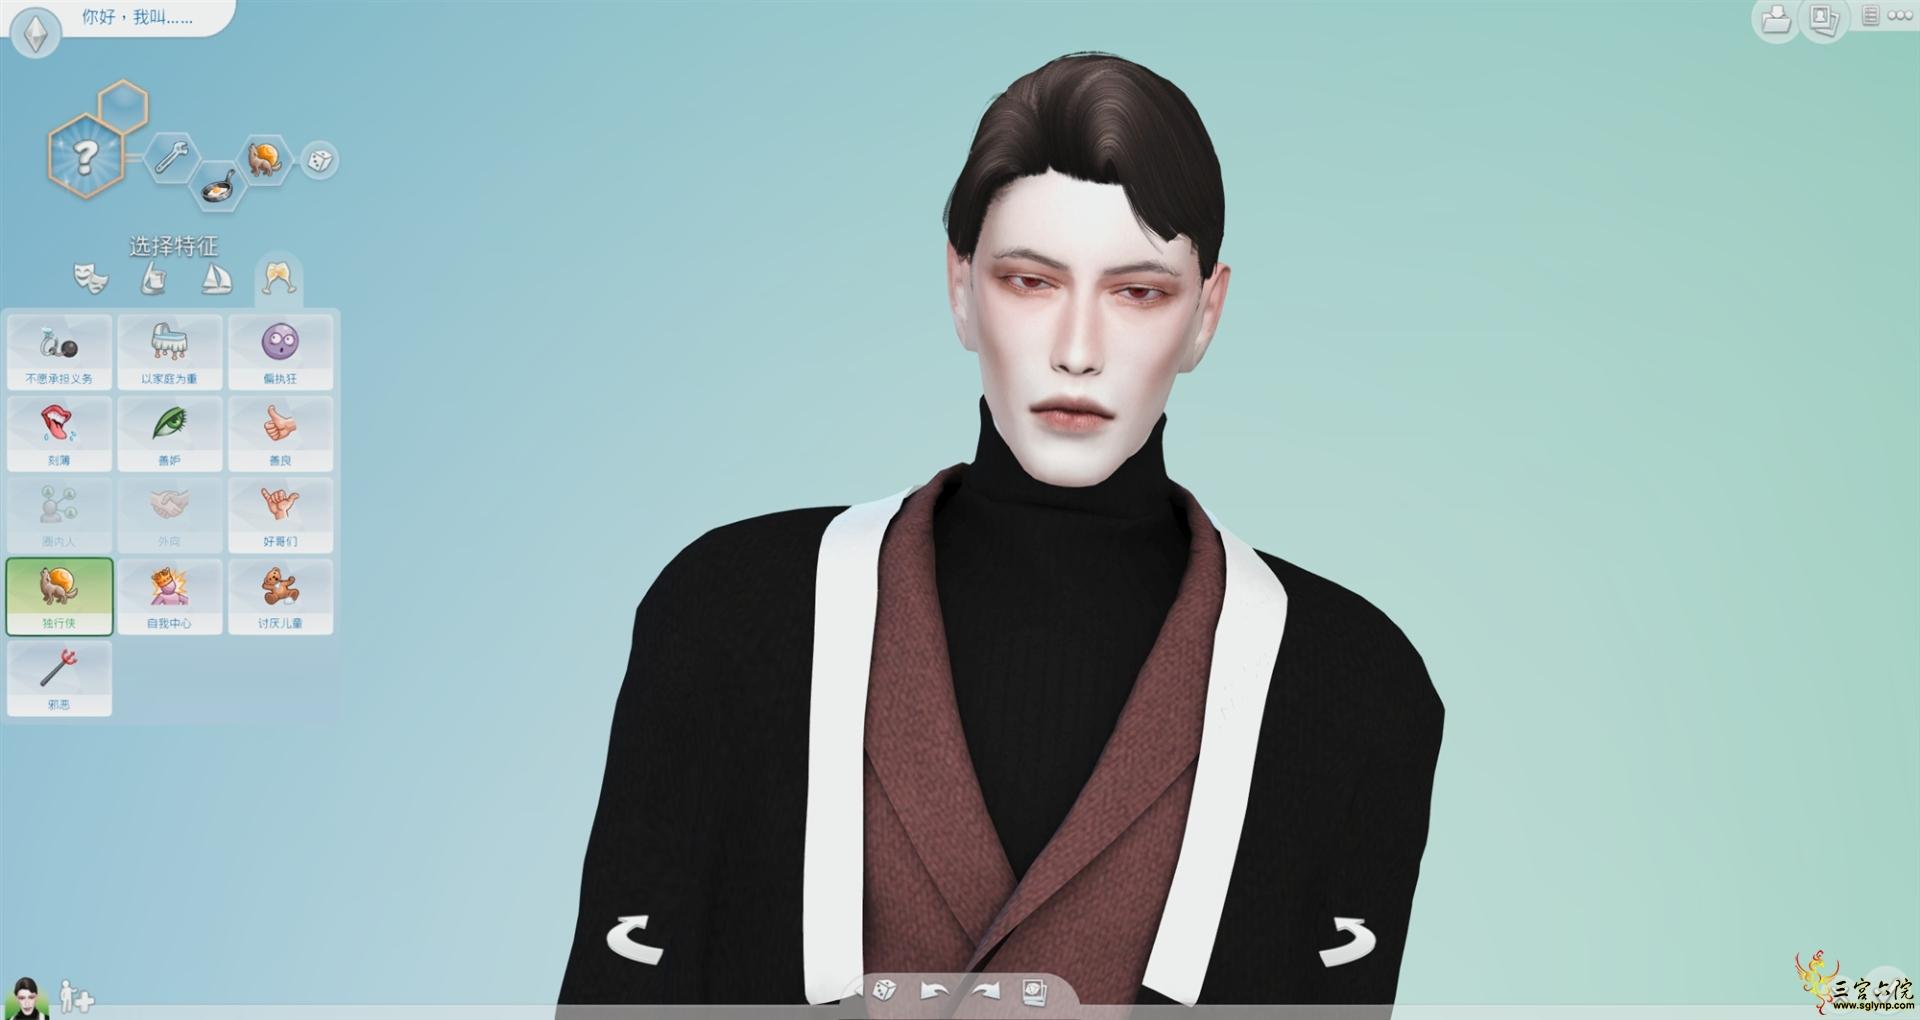 Sims 4 Screenshot 2020.10.07 - 15.01.39.06_副本.jpg